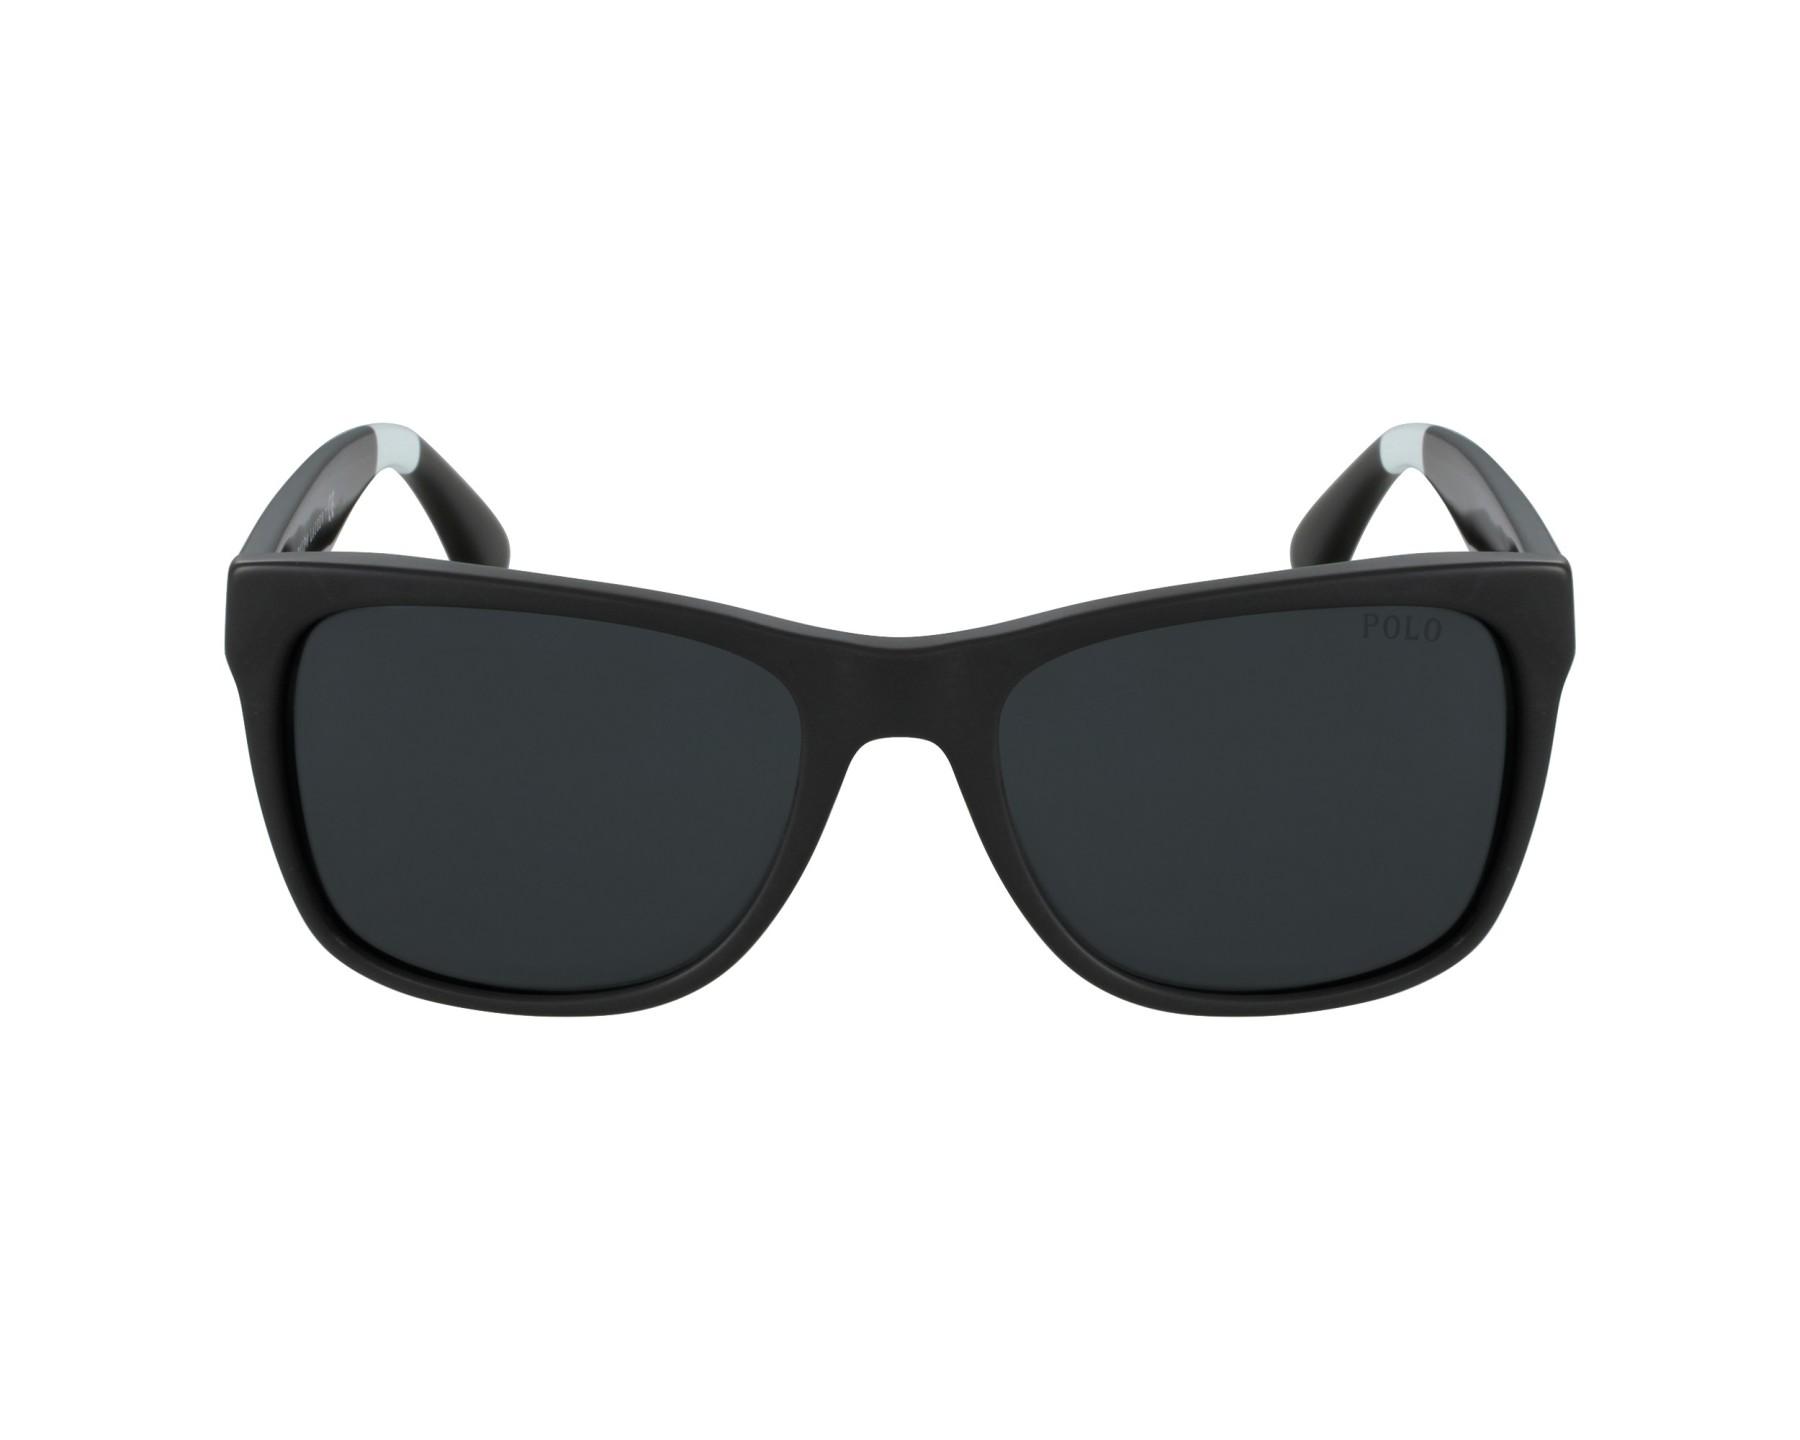 4106 Gafas Sol Lauren 557187 De Ph Polo Ralph wOkZuTiPX